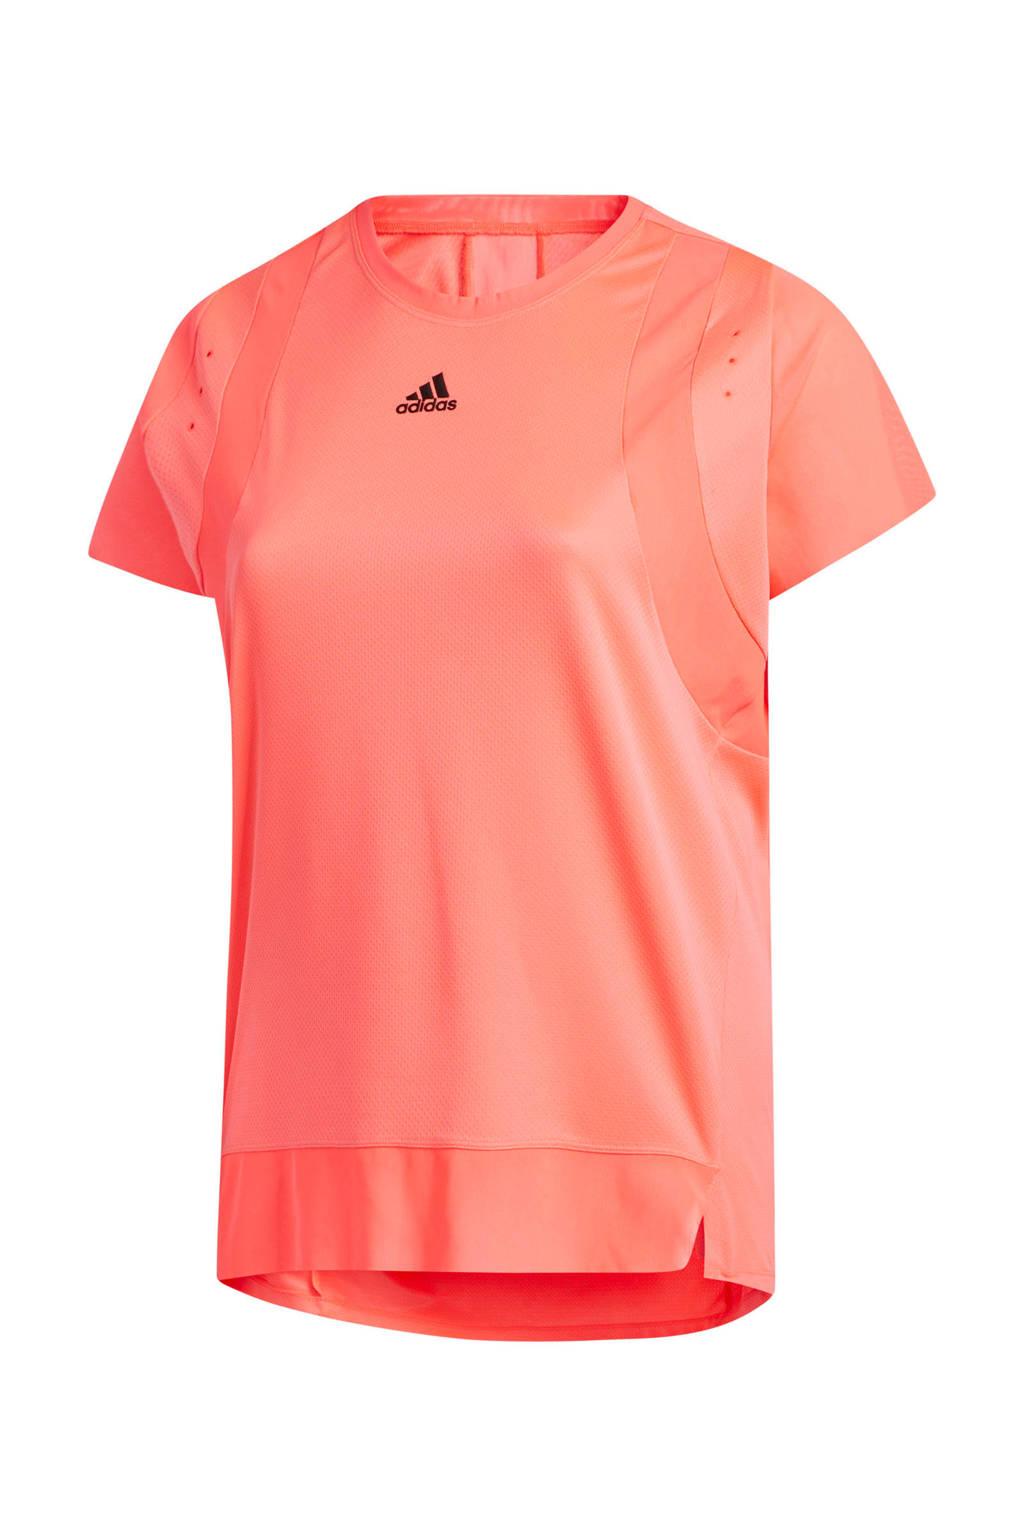 adidas Performance Plus Size sport T-shirt oranje, Oranje